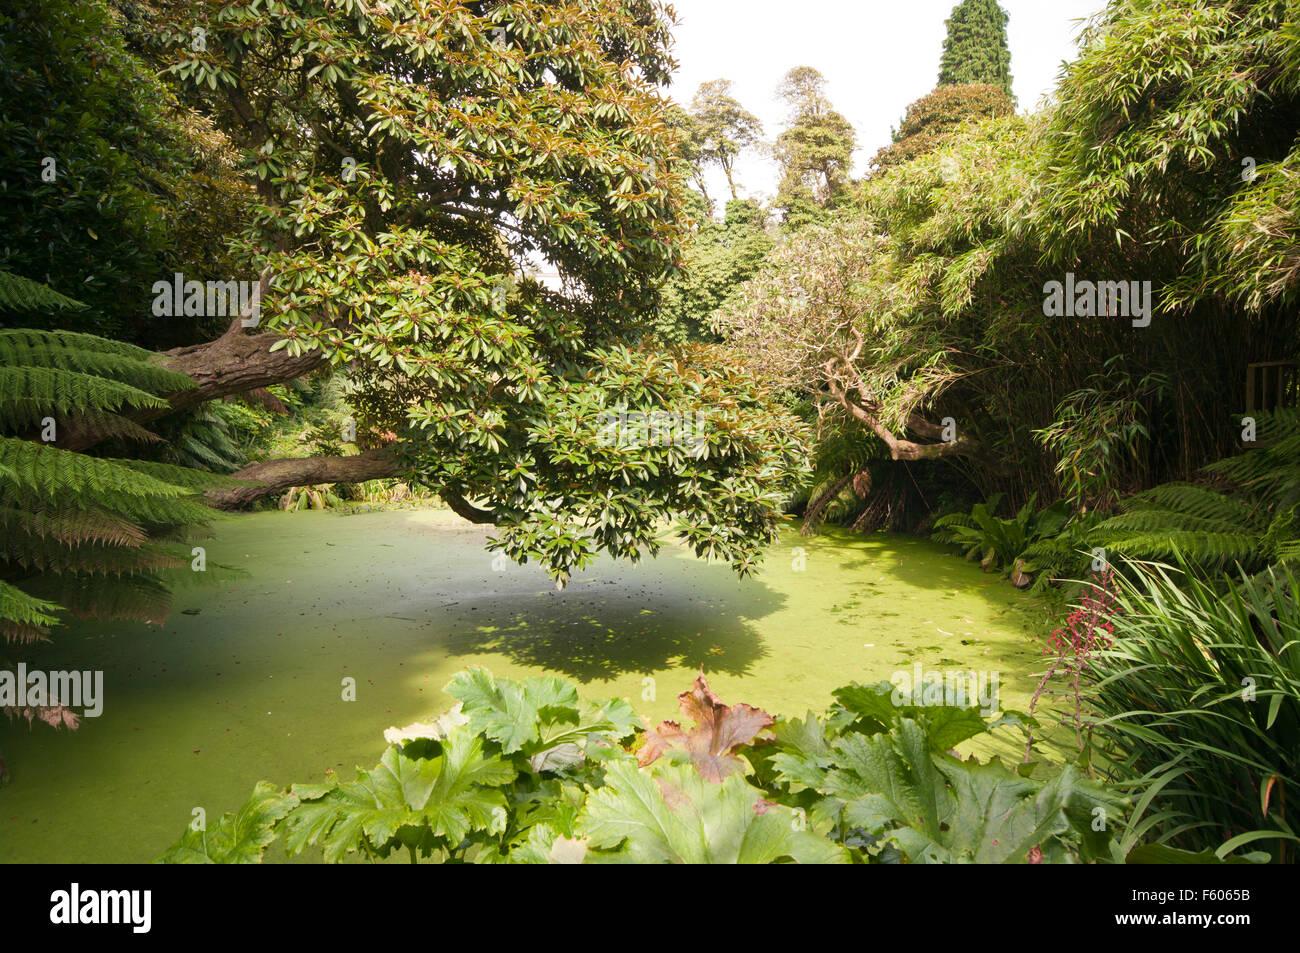 Heligan Stock Photos & Heligan Stock Images - Alamy